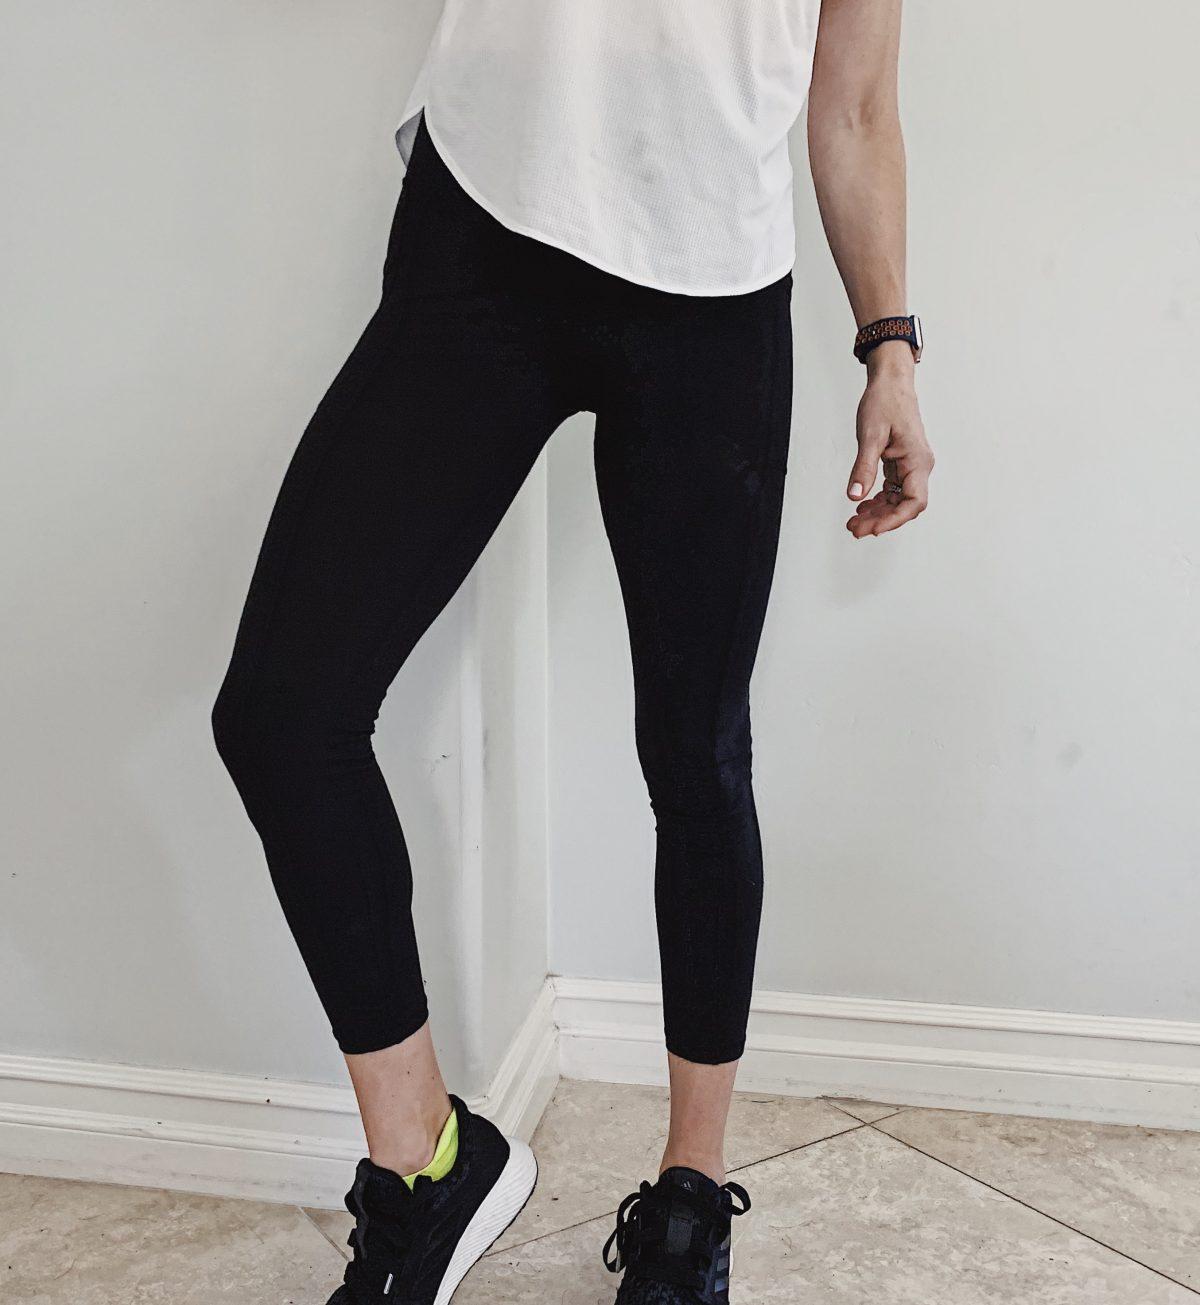 the best amazon leggings